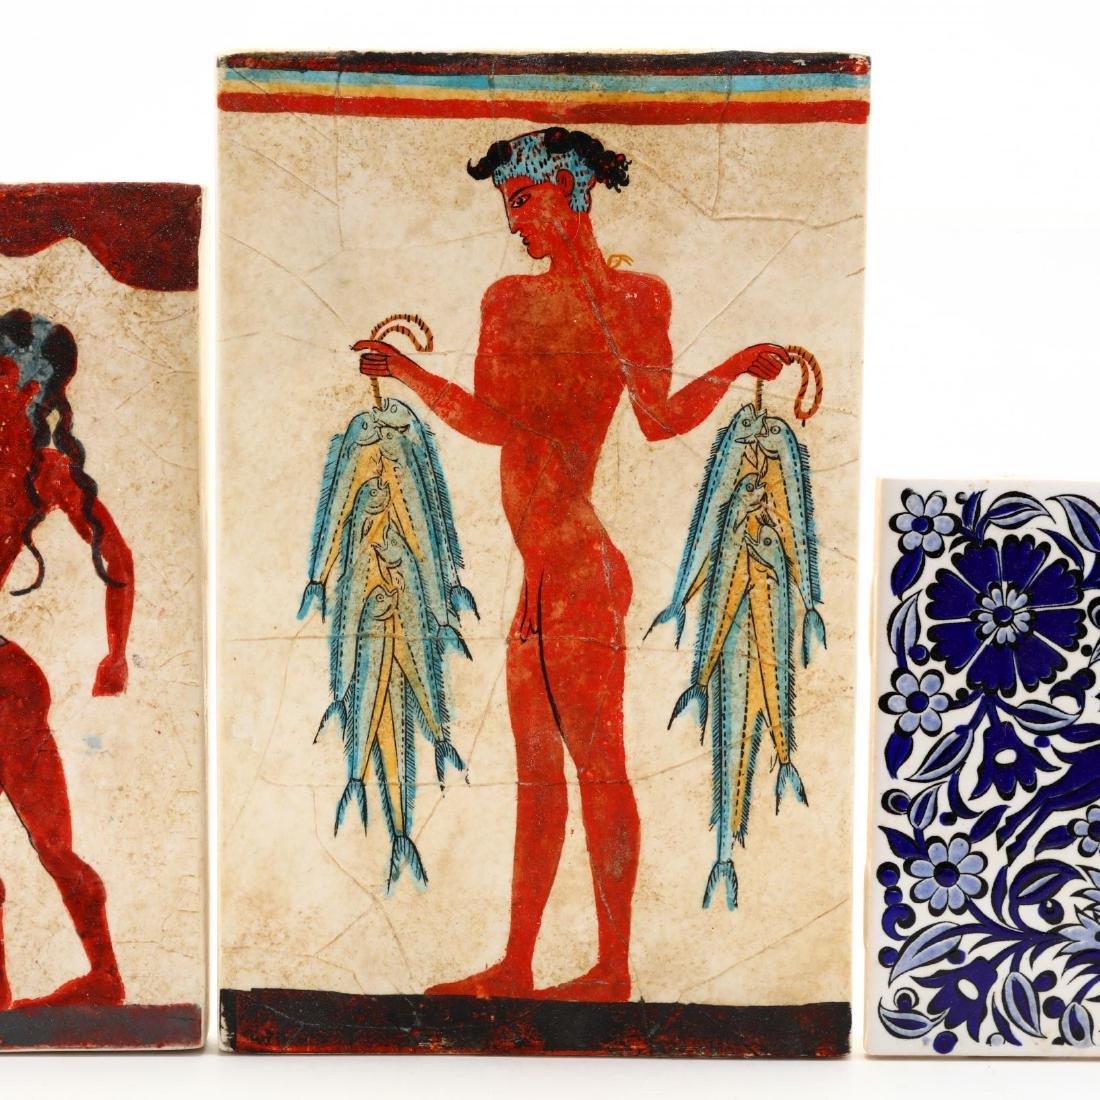 Three Hand-Painted Greek Tiles - 2